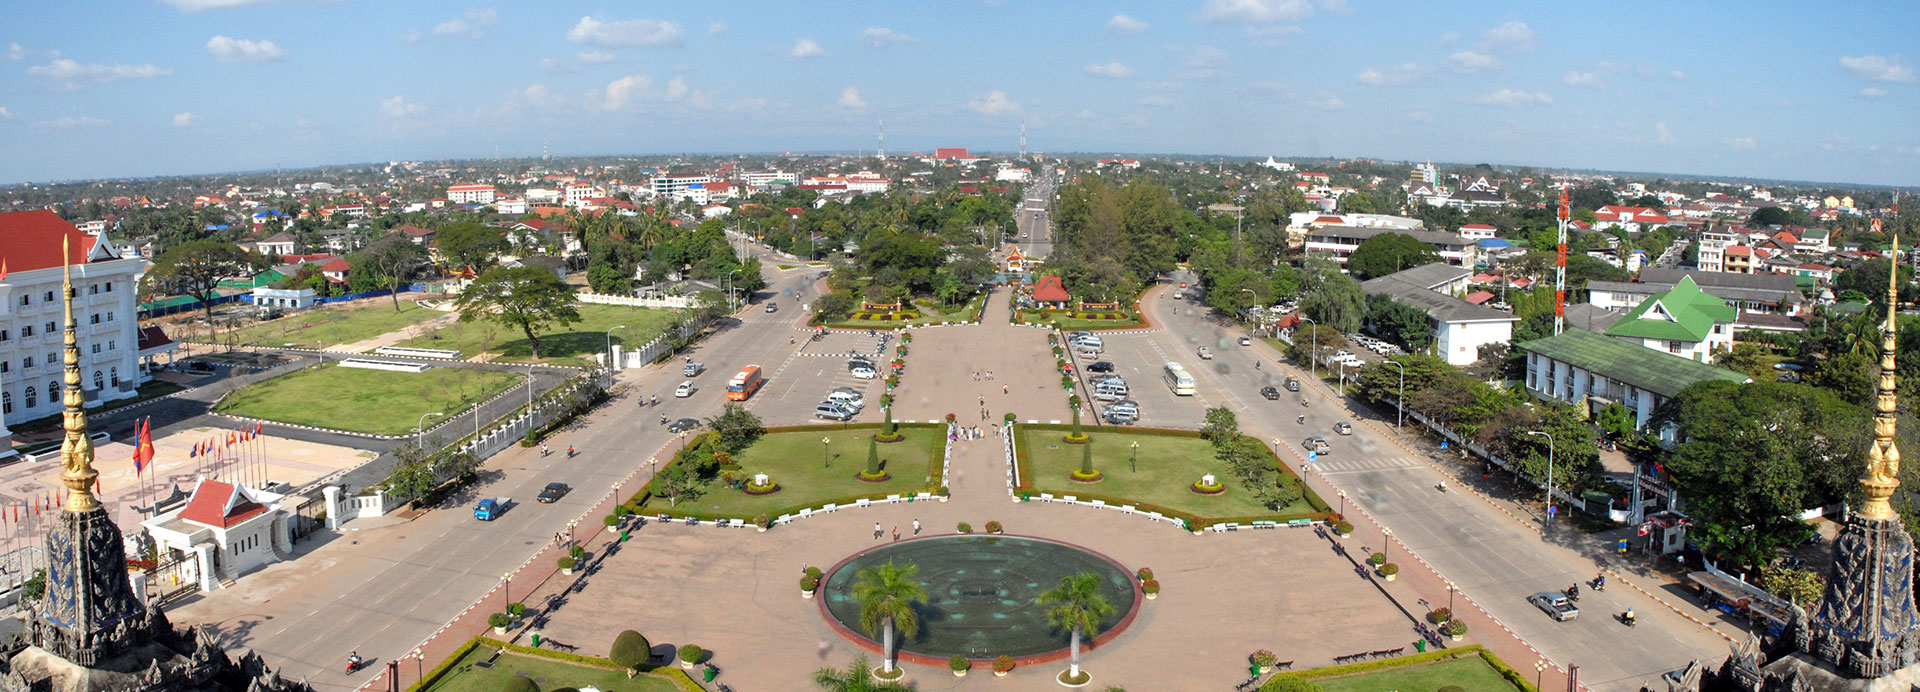 Vientiane view from patuxai - Vientiane Travel Guide